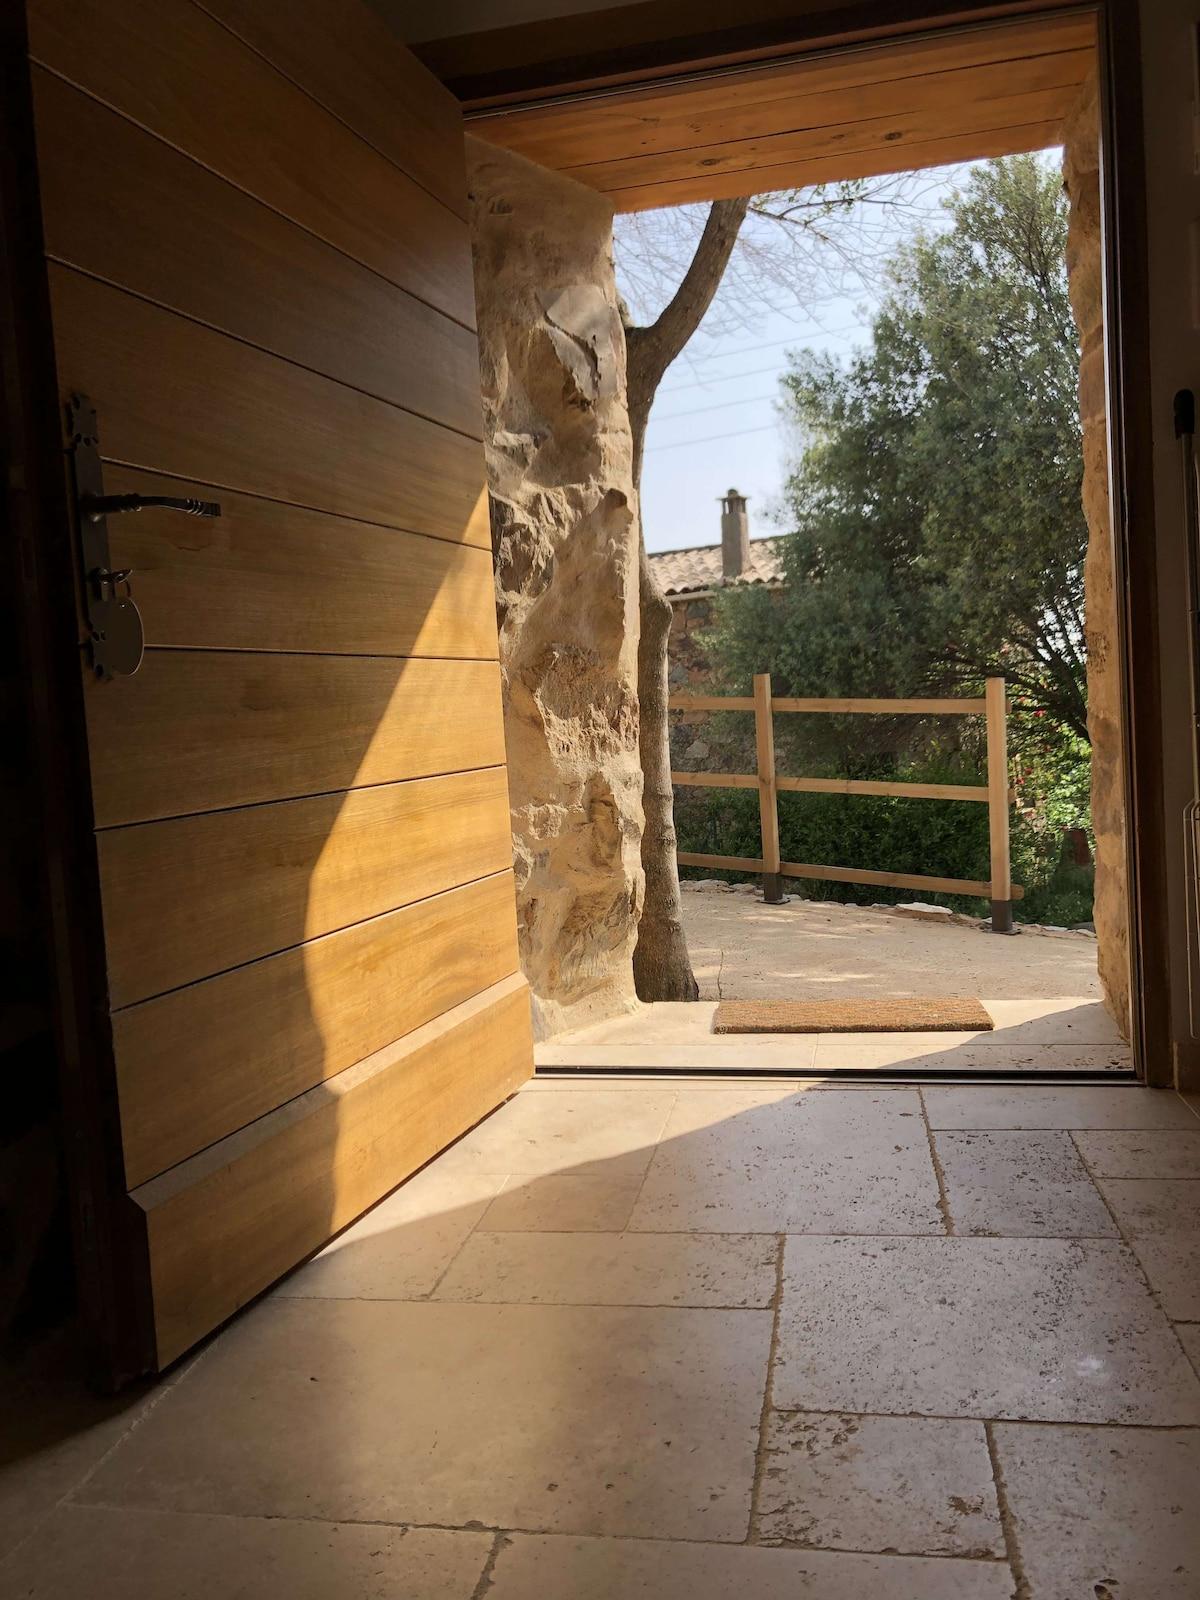 Cargèse 2018 (with Photos): Top 20 Cargèse Vacation Rentals, Vacation Homes  U0026 Condo Rentals   Airbnb Cargèse, Corsica, France